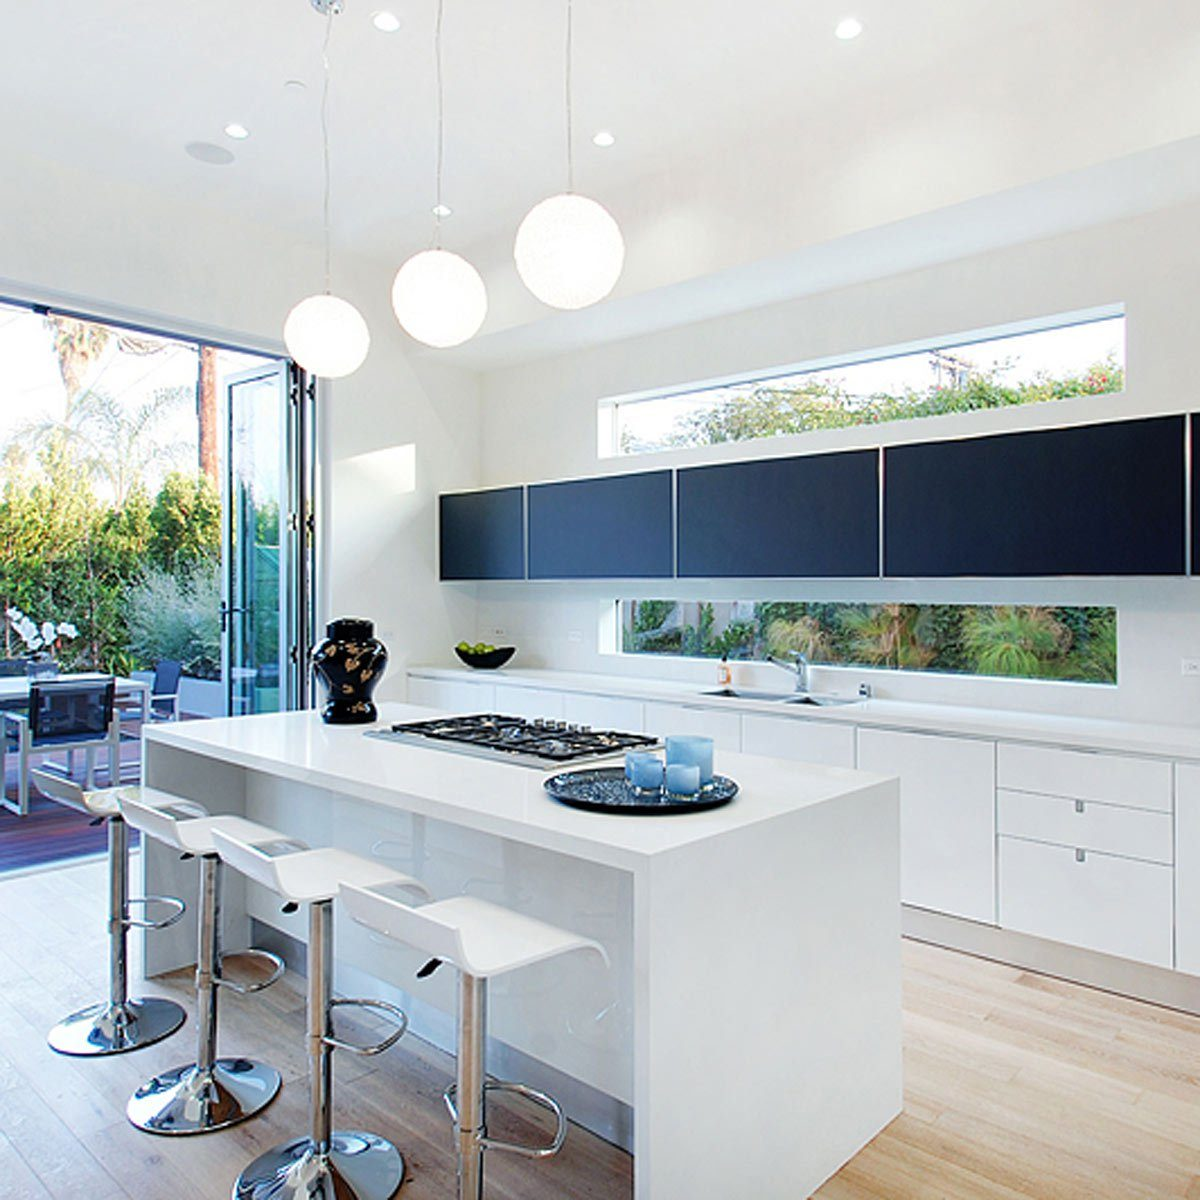 30 Kitchen Backsplash Ideas | Taste of Home